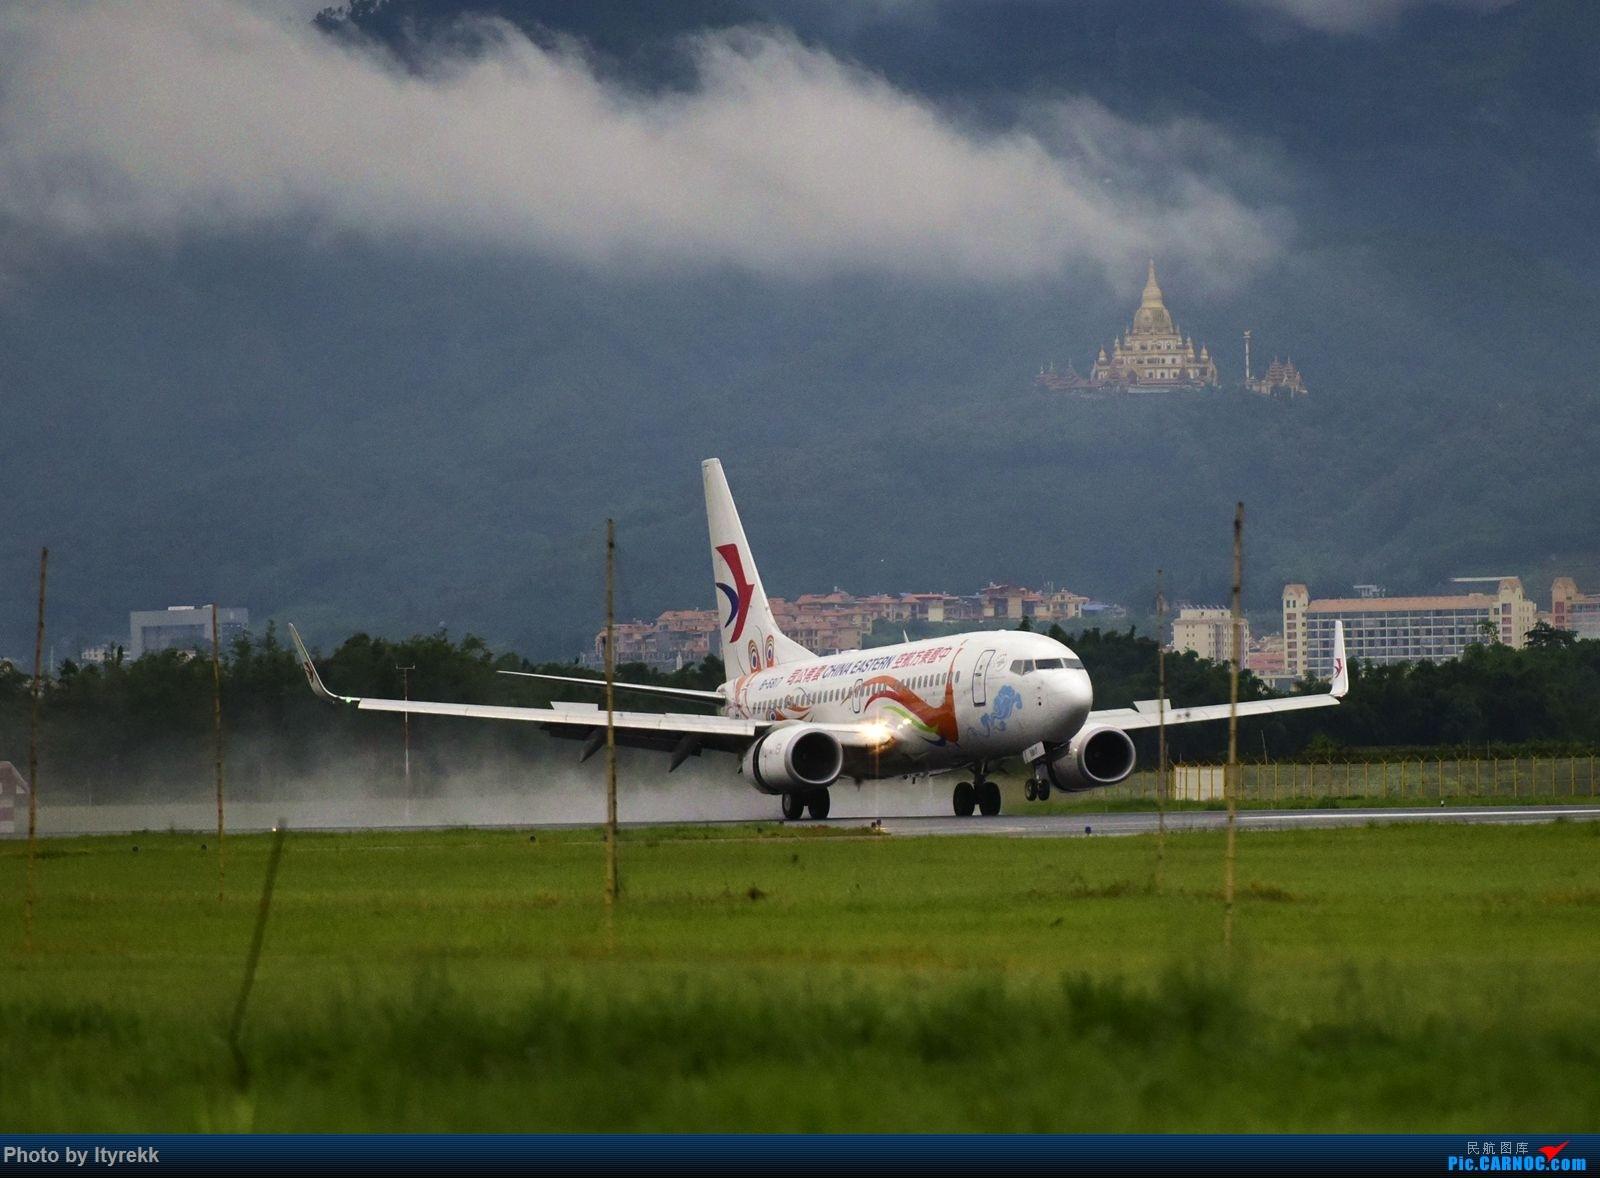 Re:[原创]怀念暑假时飞友们在一起拍机的日子 BOEING 737-700 B-5817 中国芒市机场